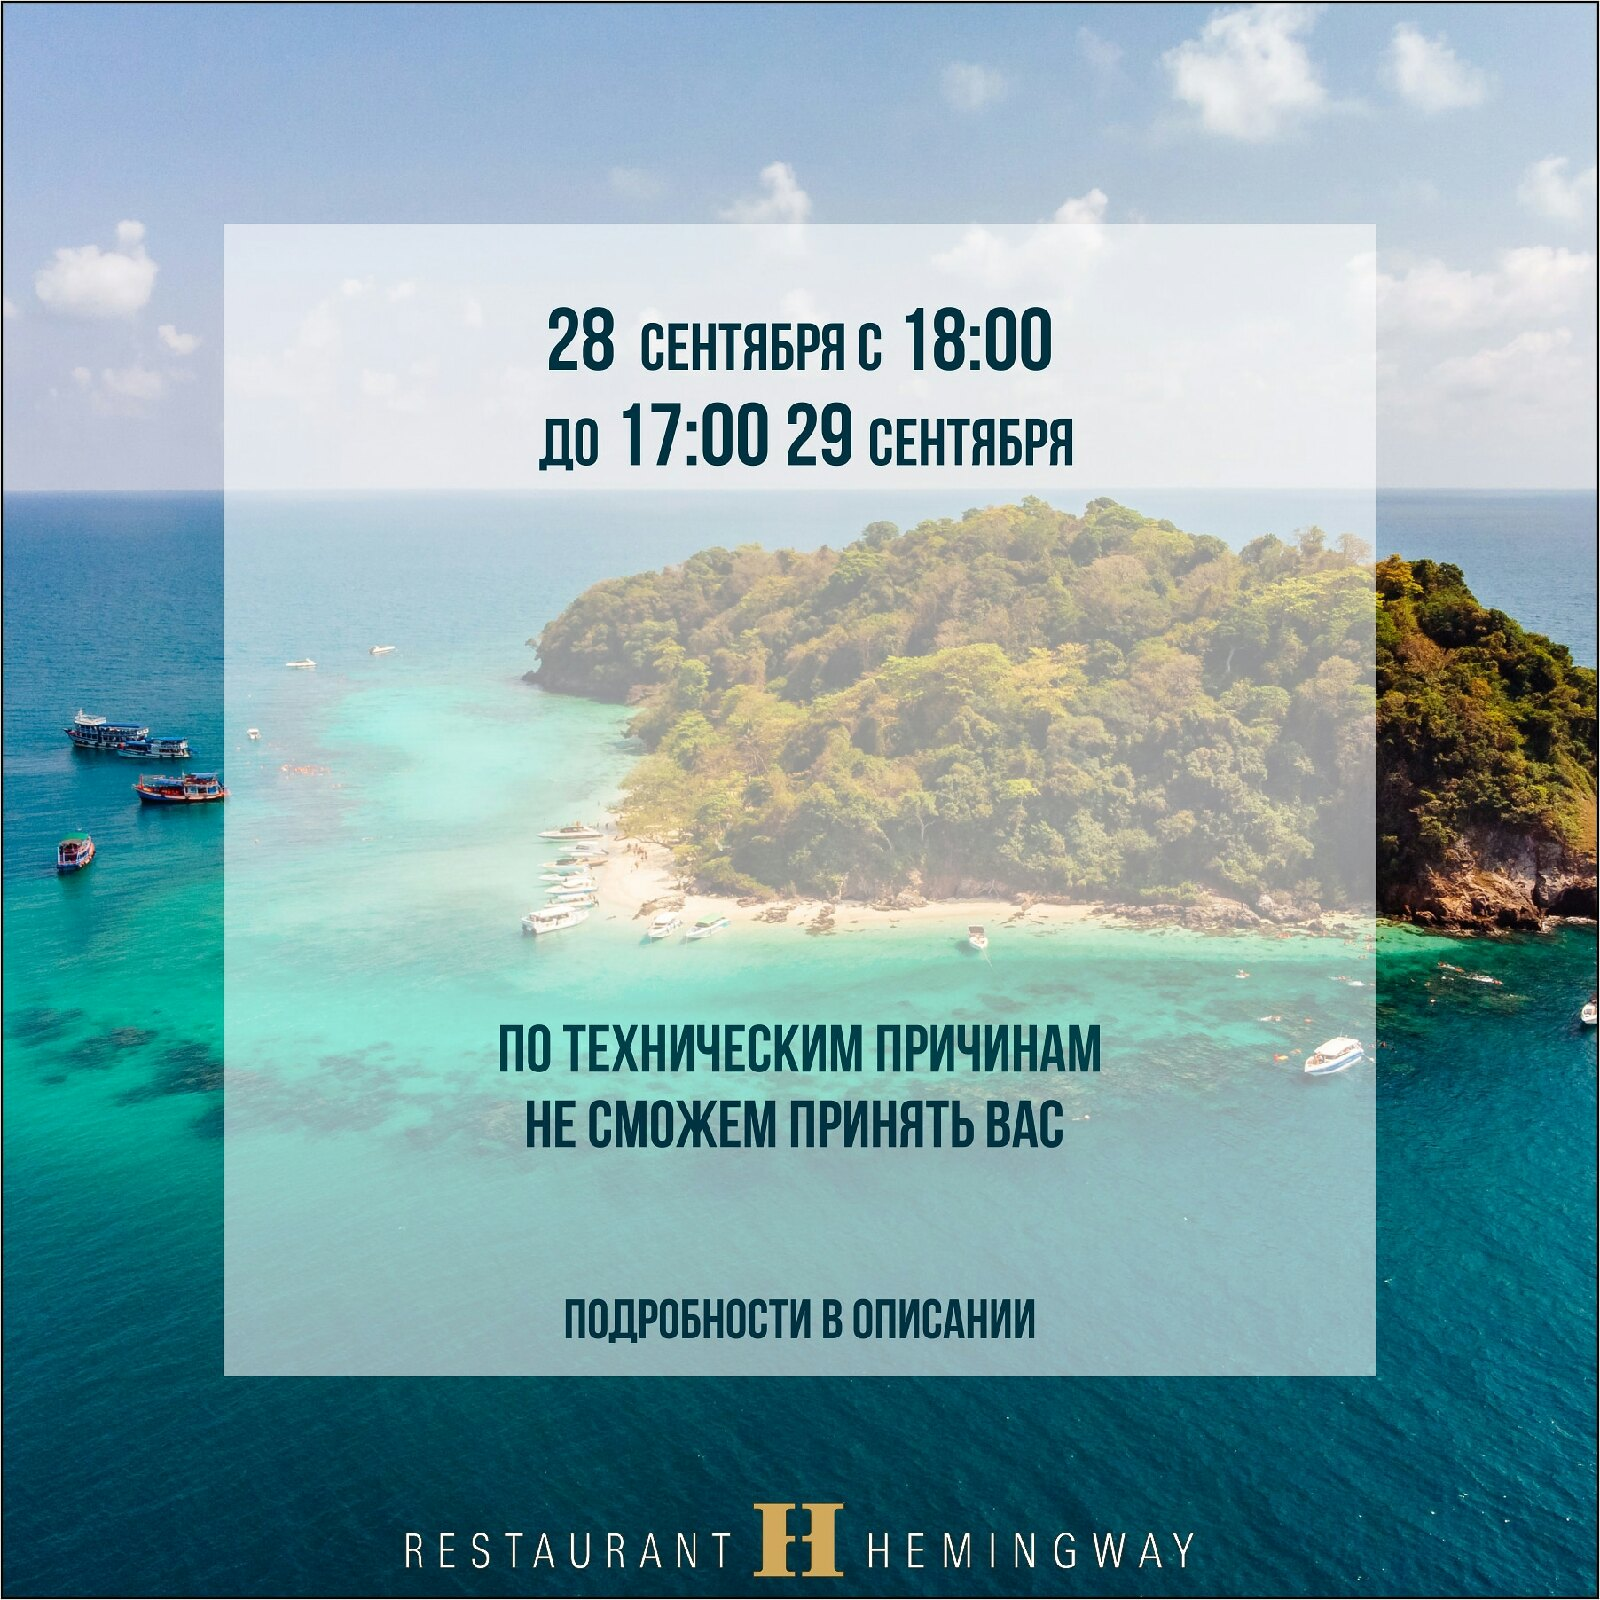 Ресторан «Hemingway» - Вконтакте